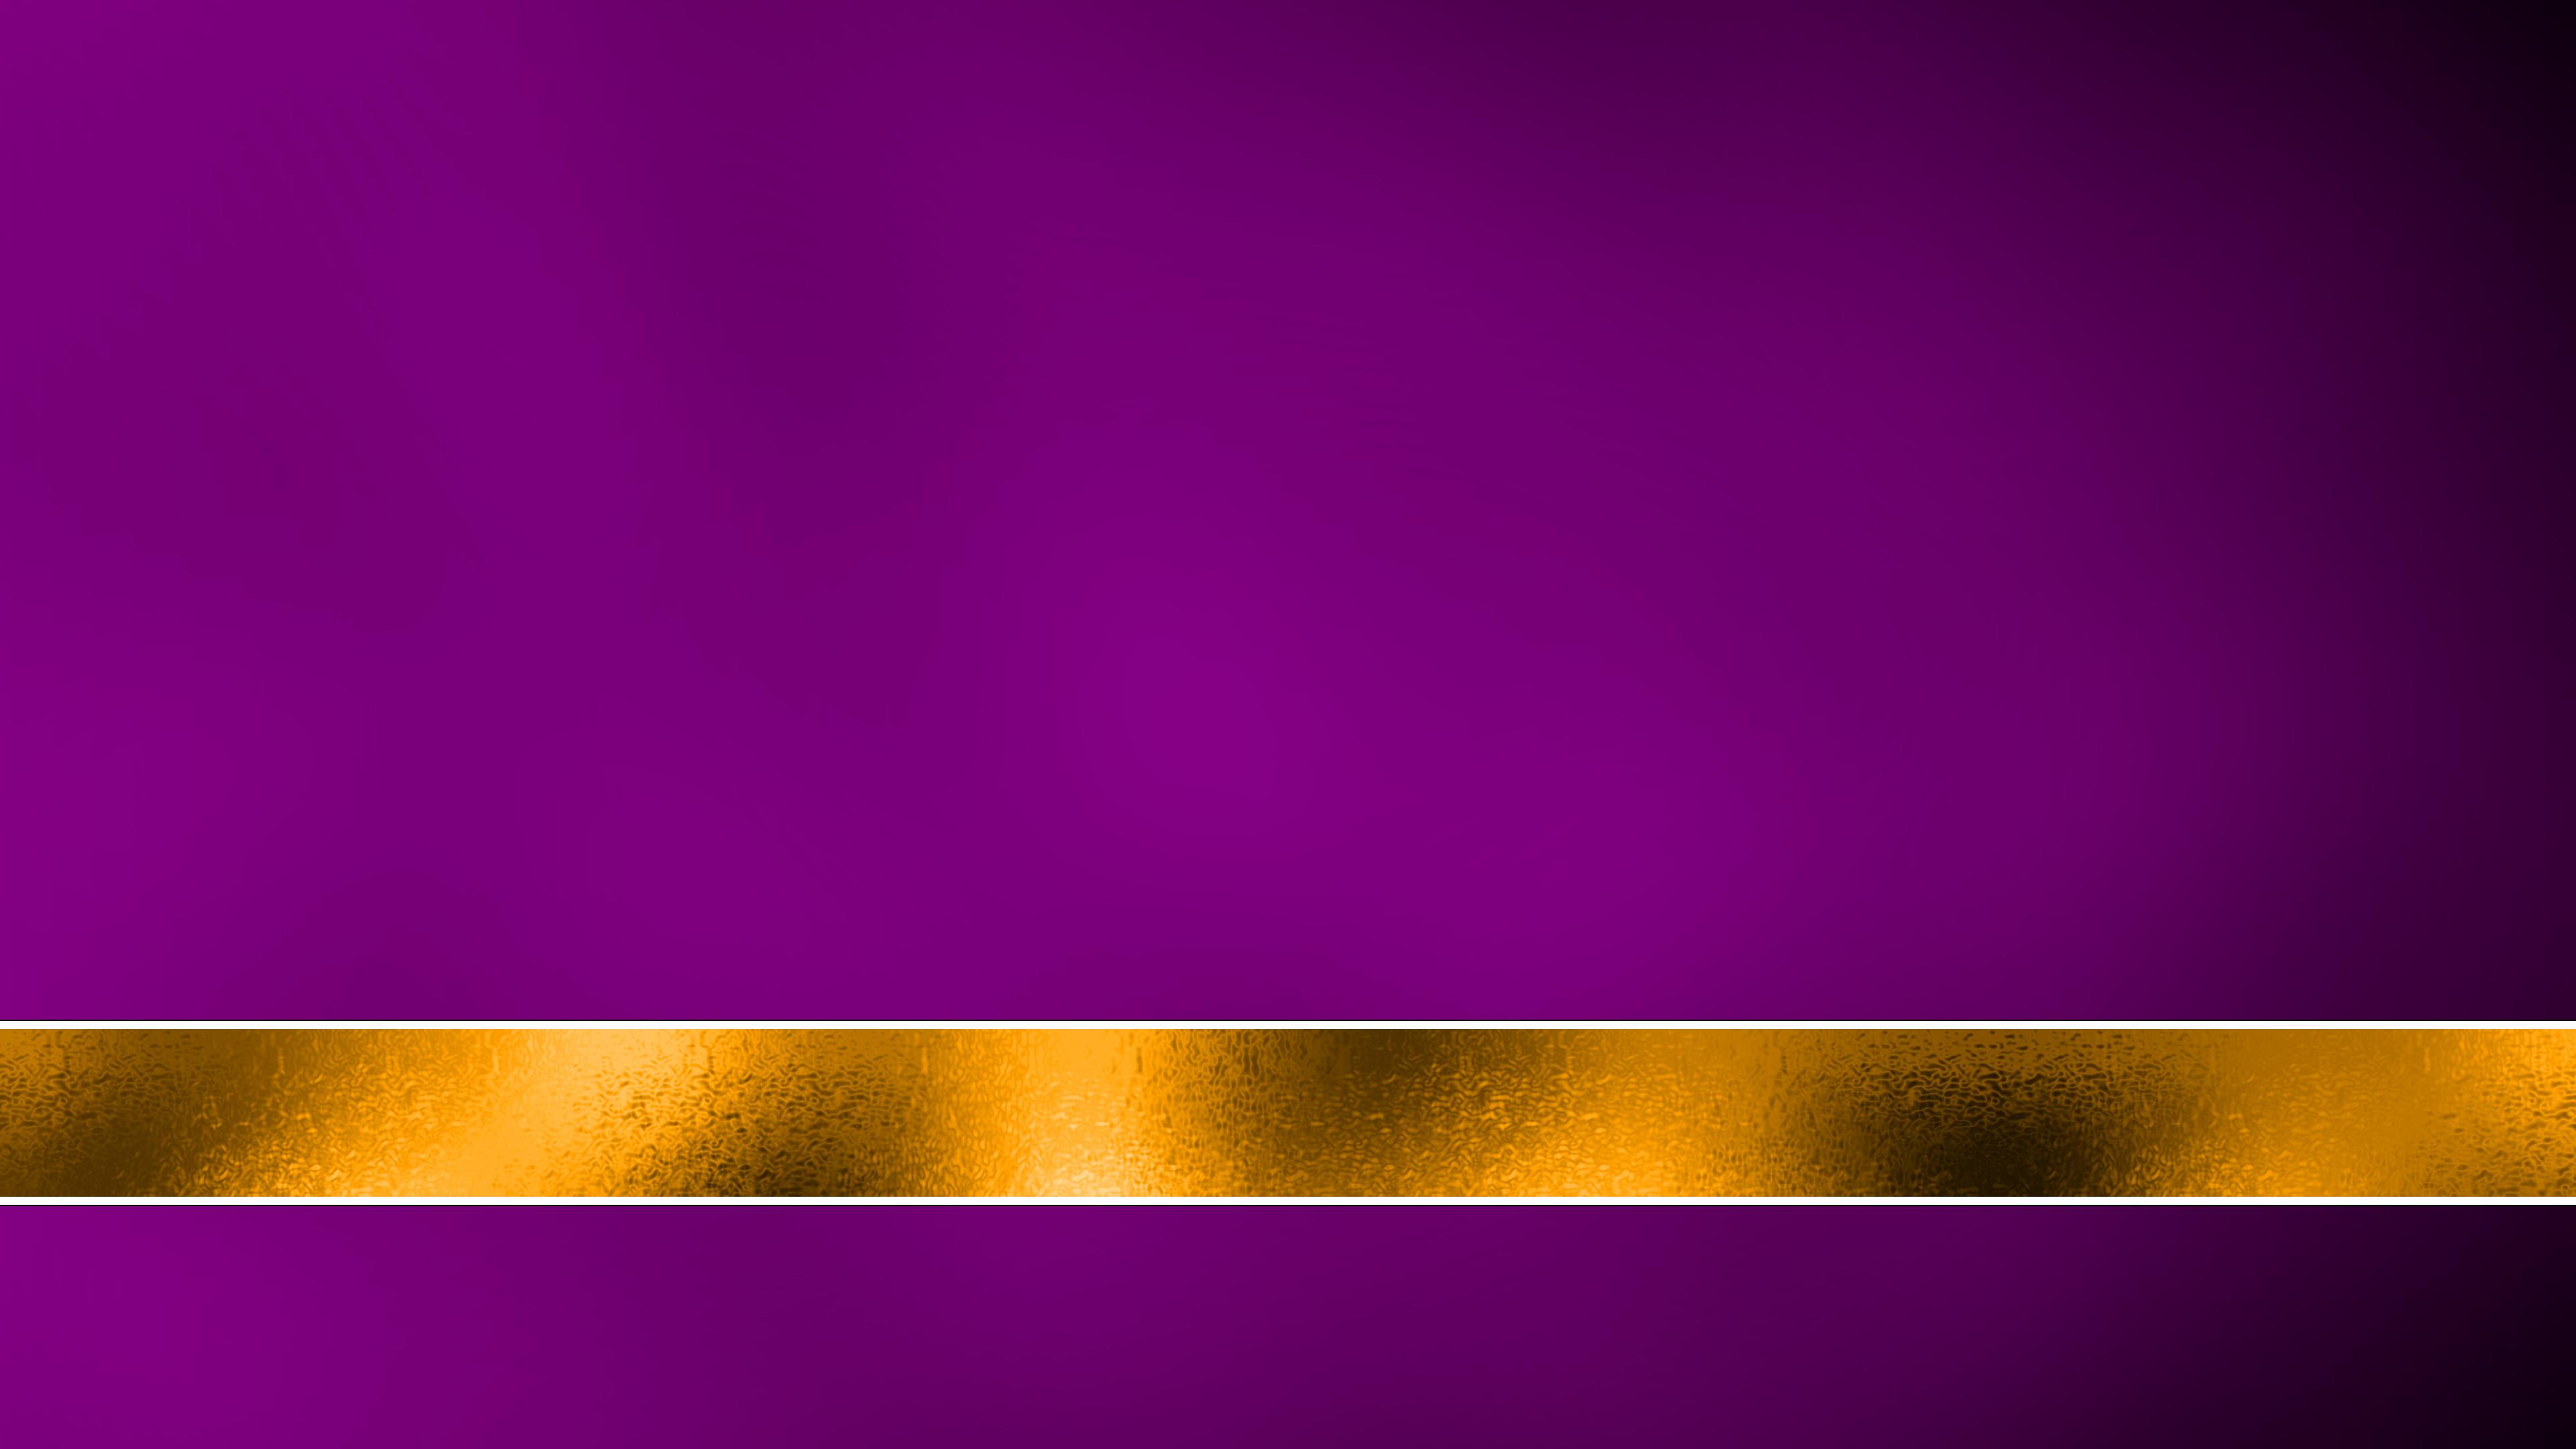 Purple And Gold Wallpaper Www Pixshark Com Images